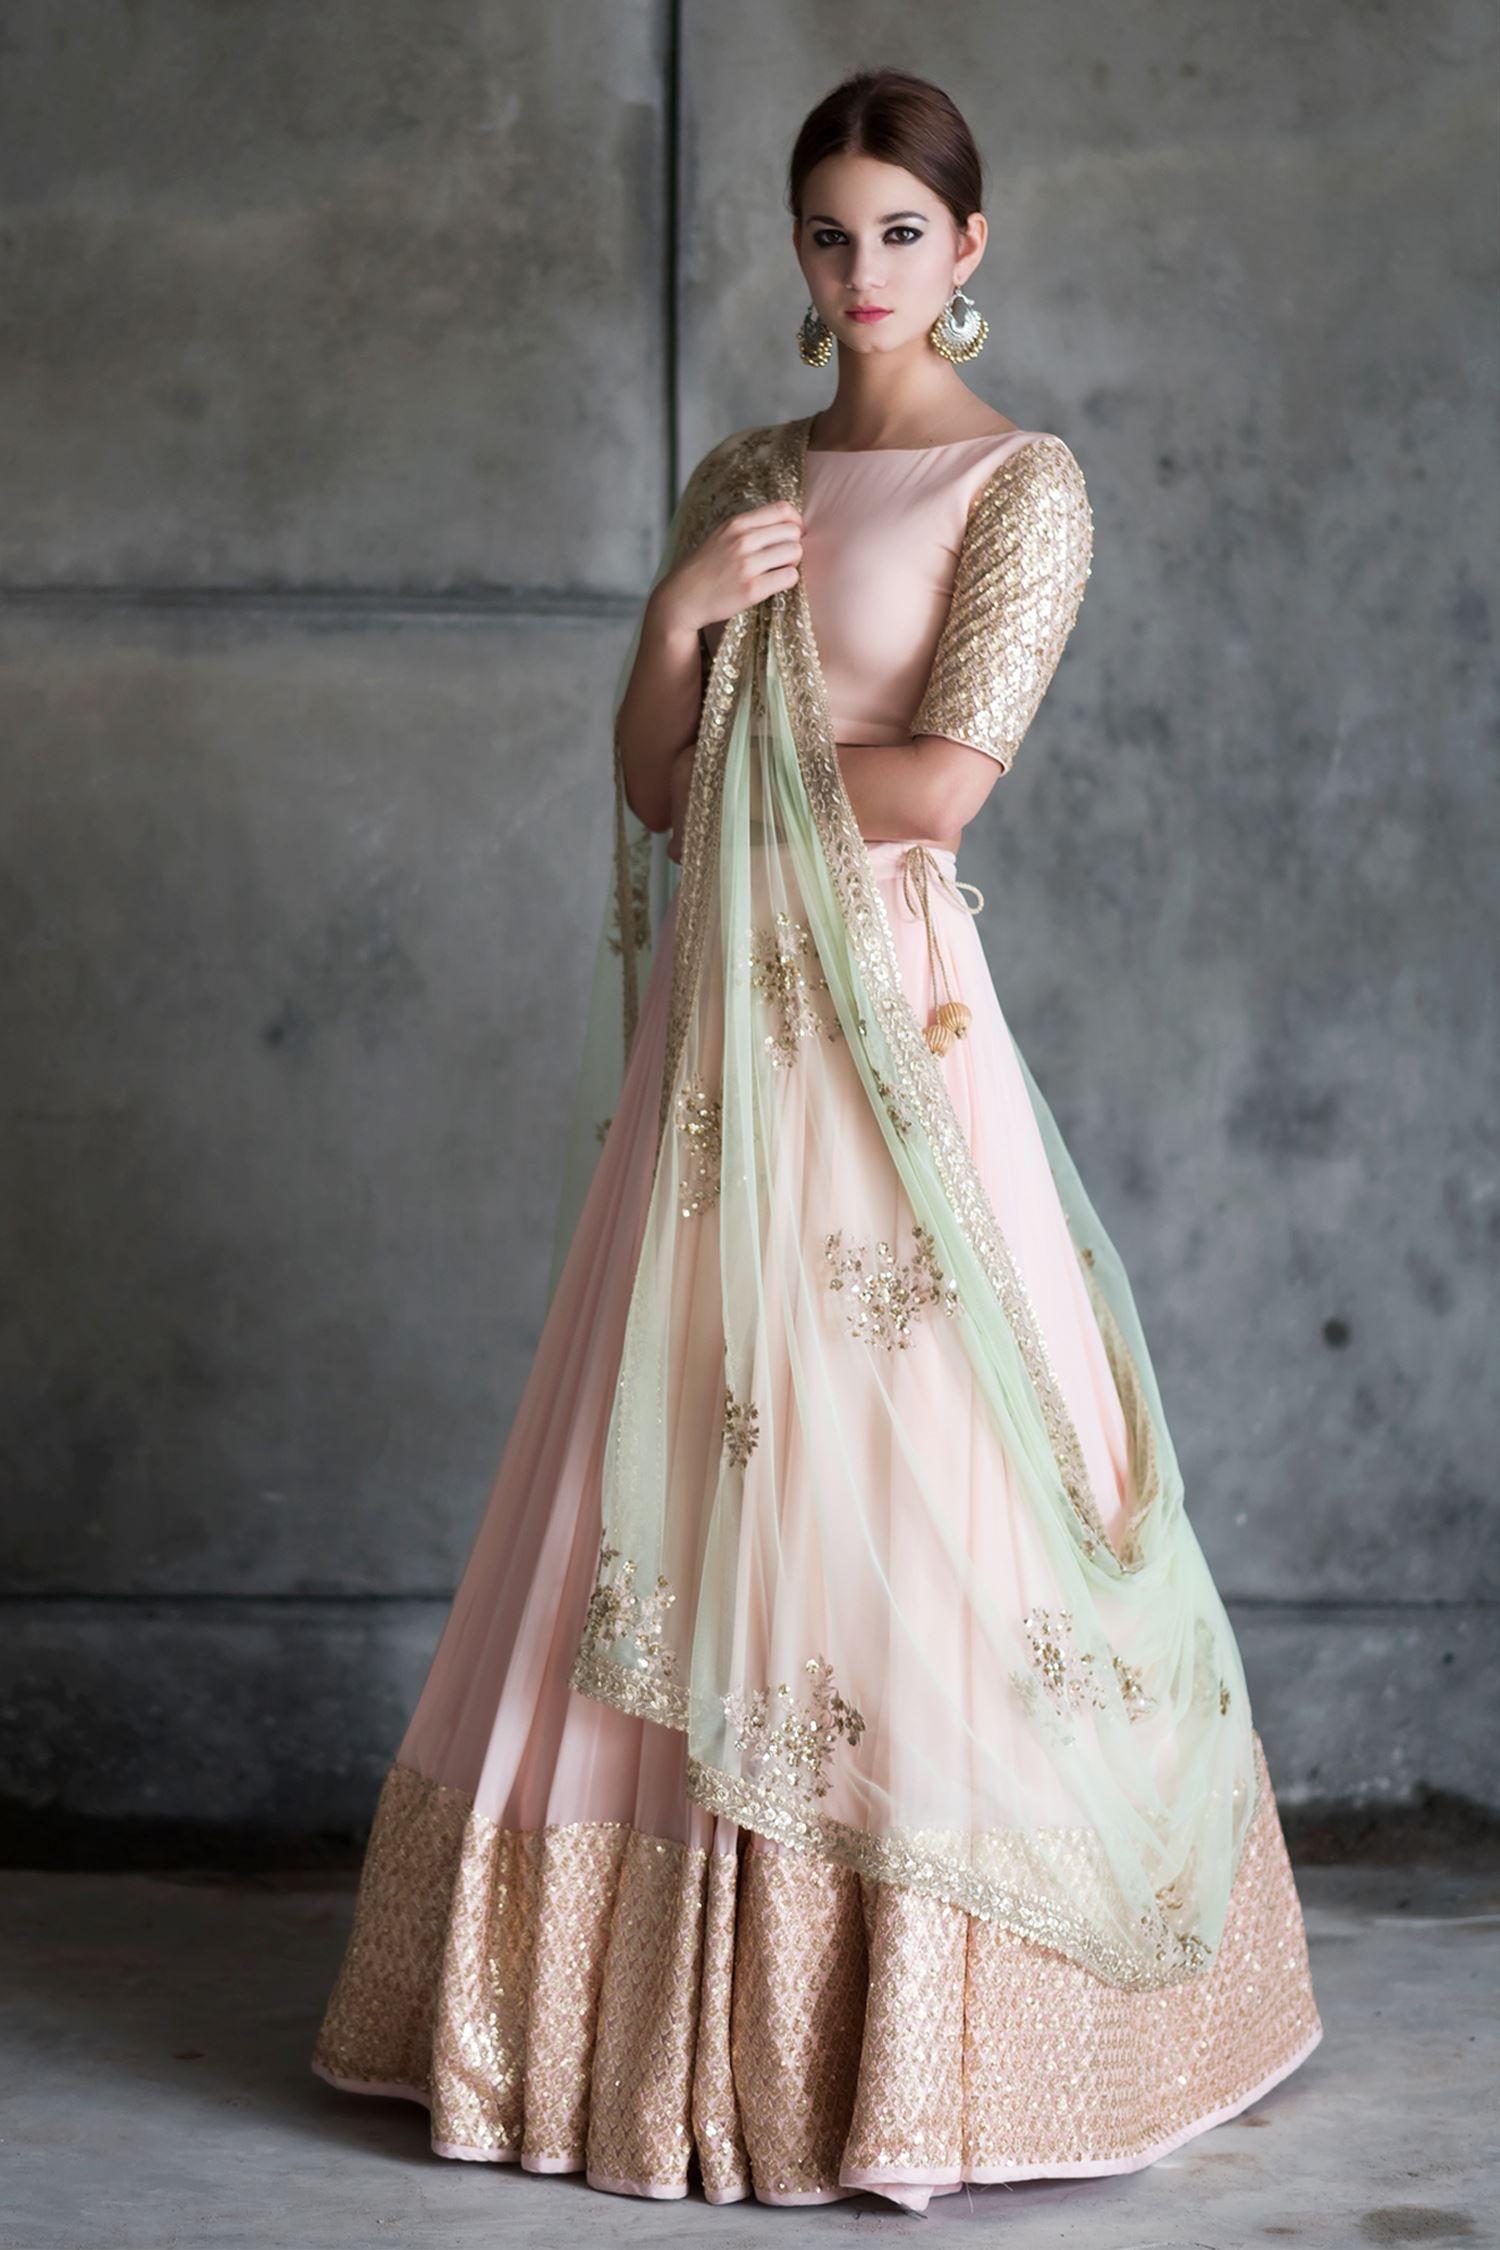 fb9b600d7dd Buy Blush pink & gold embellished lehenga set by Prathyusha Garimella at  Aza Fashions Saris,